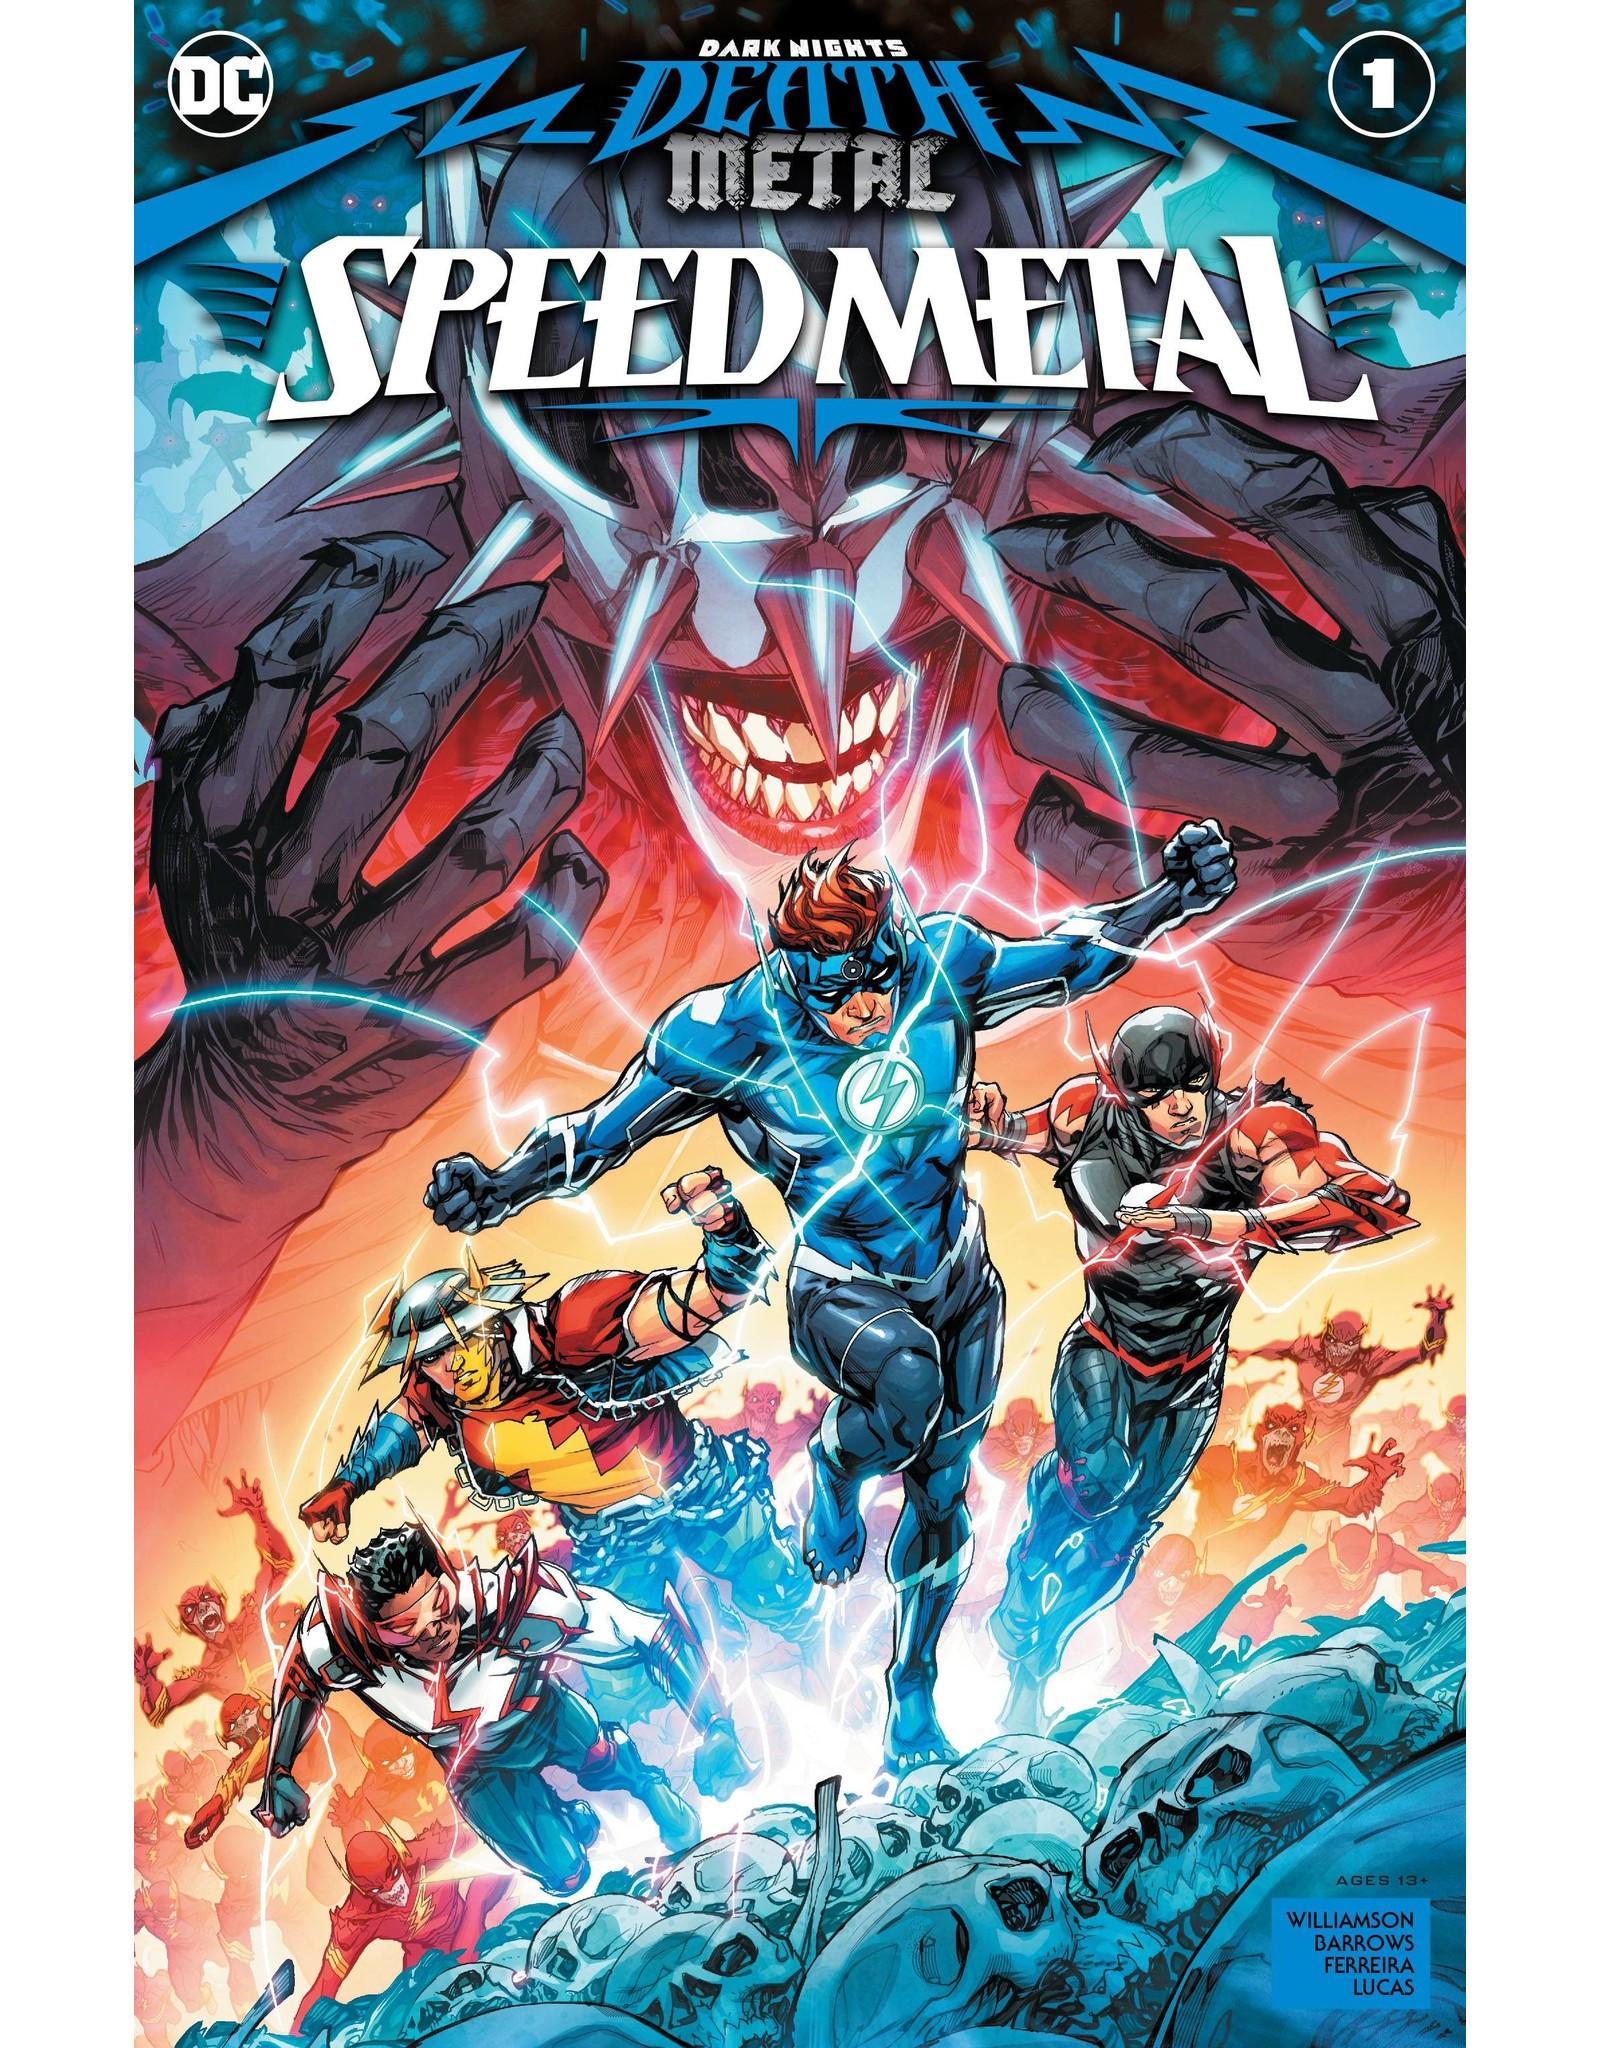 DC COMICS DARK NIGHTS DEATH METAL SPEED METAL #1 (ONE SHOT) CVR A HOWARD PORTER